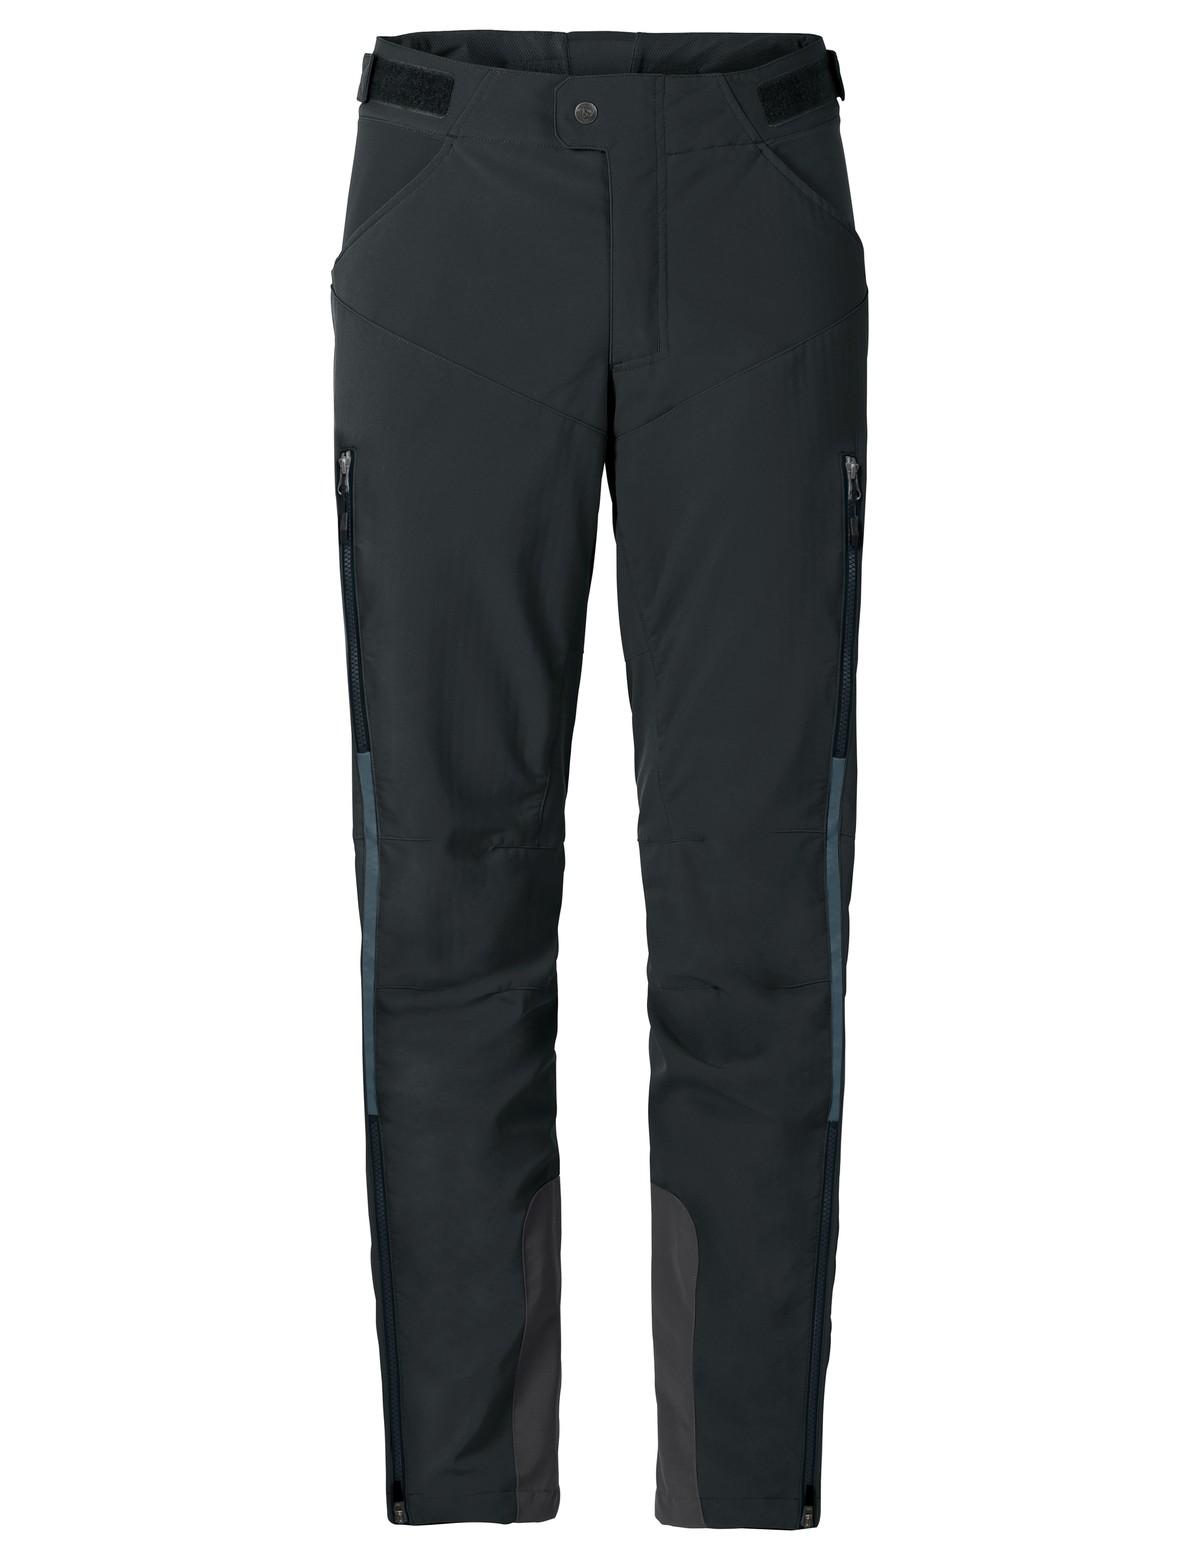 Vaude Men's Qimsa Softshell Pants II - Pantalon softshell homme